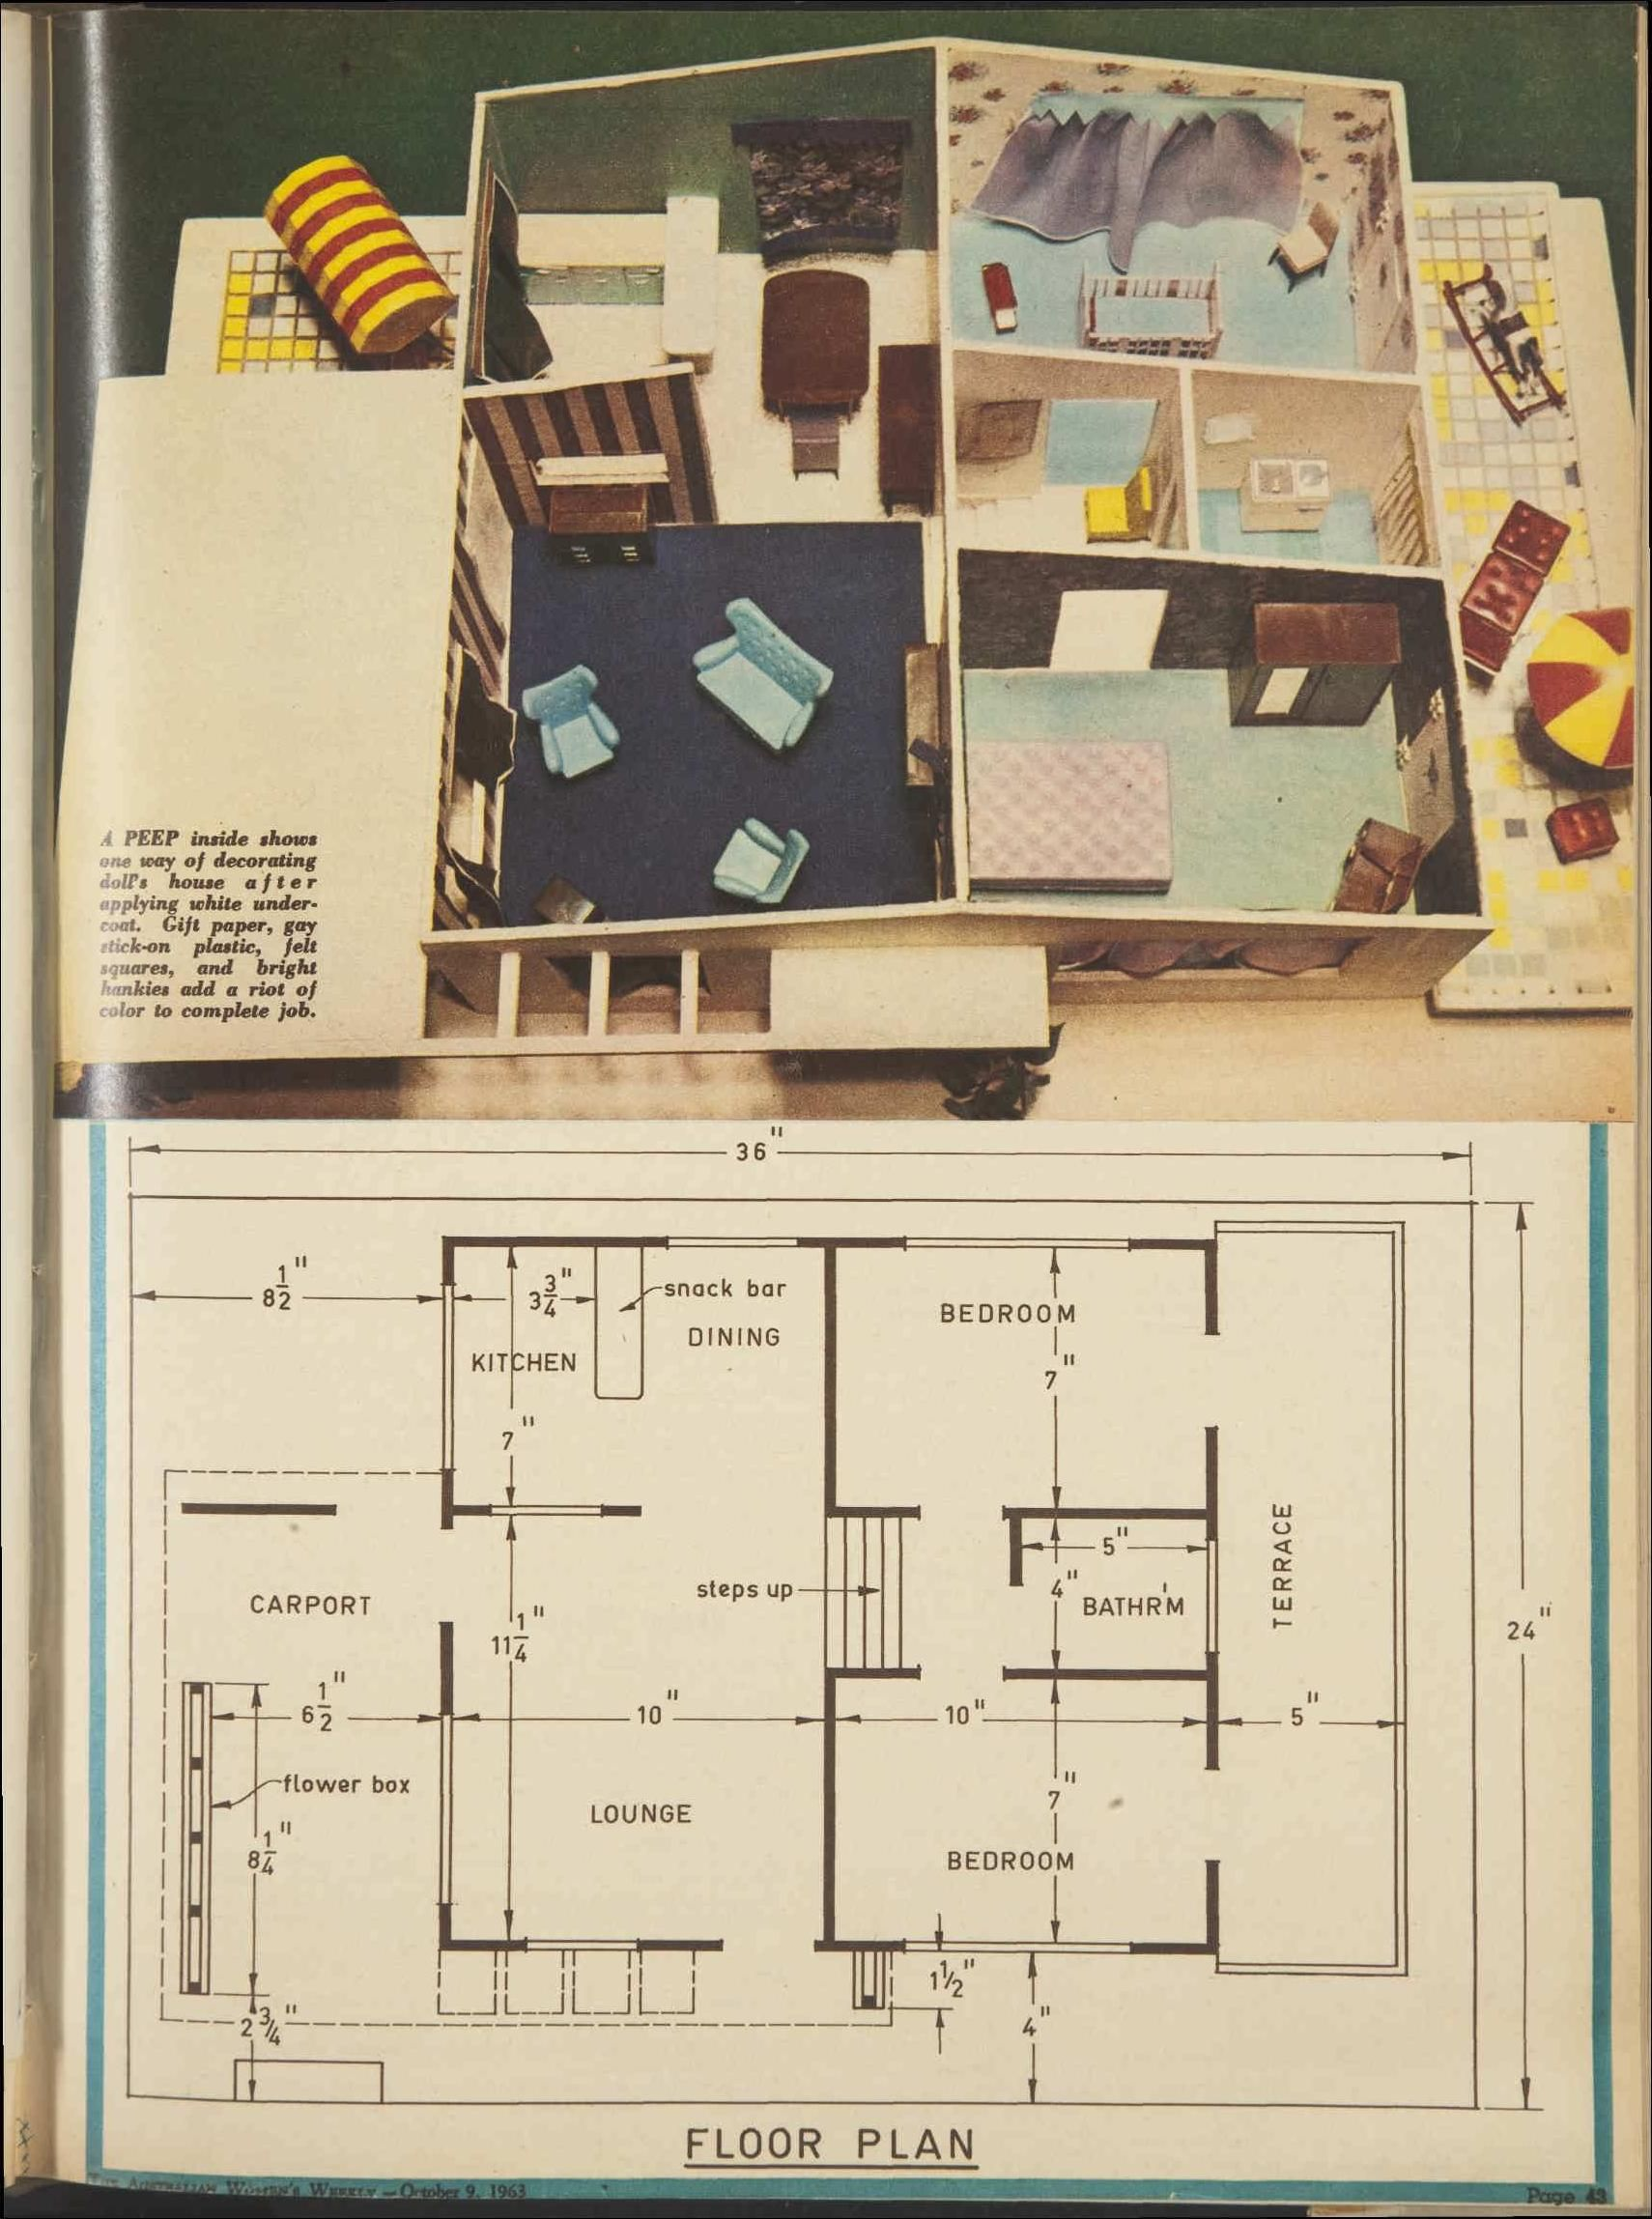 Plans for a split level 1960s doll 39 s house 9 oct 1963 for Split level house plans 1960s